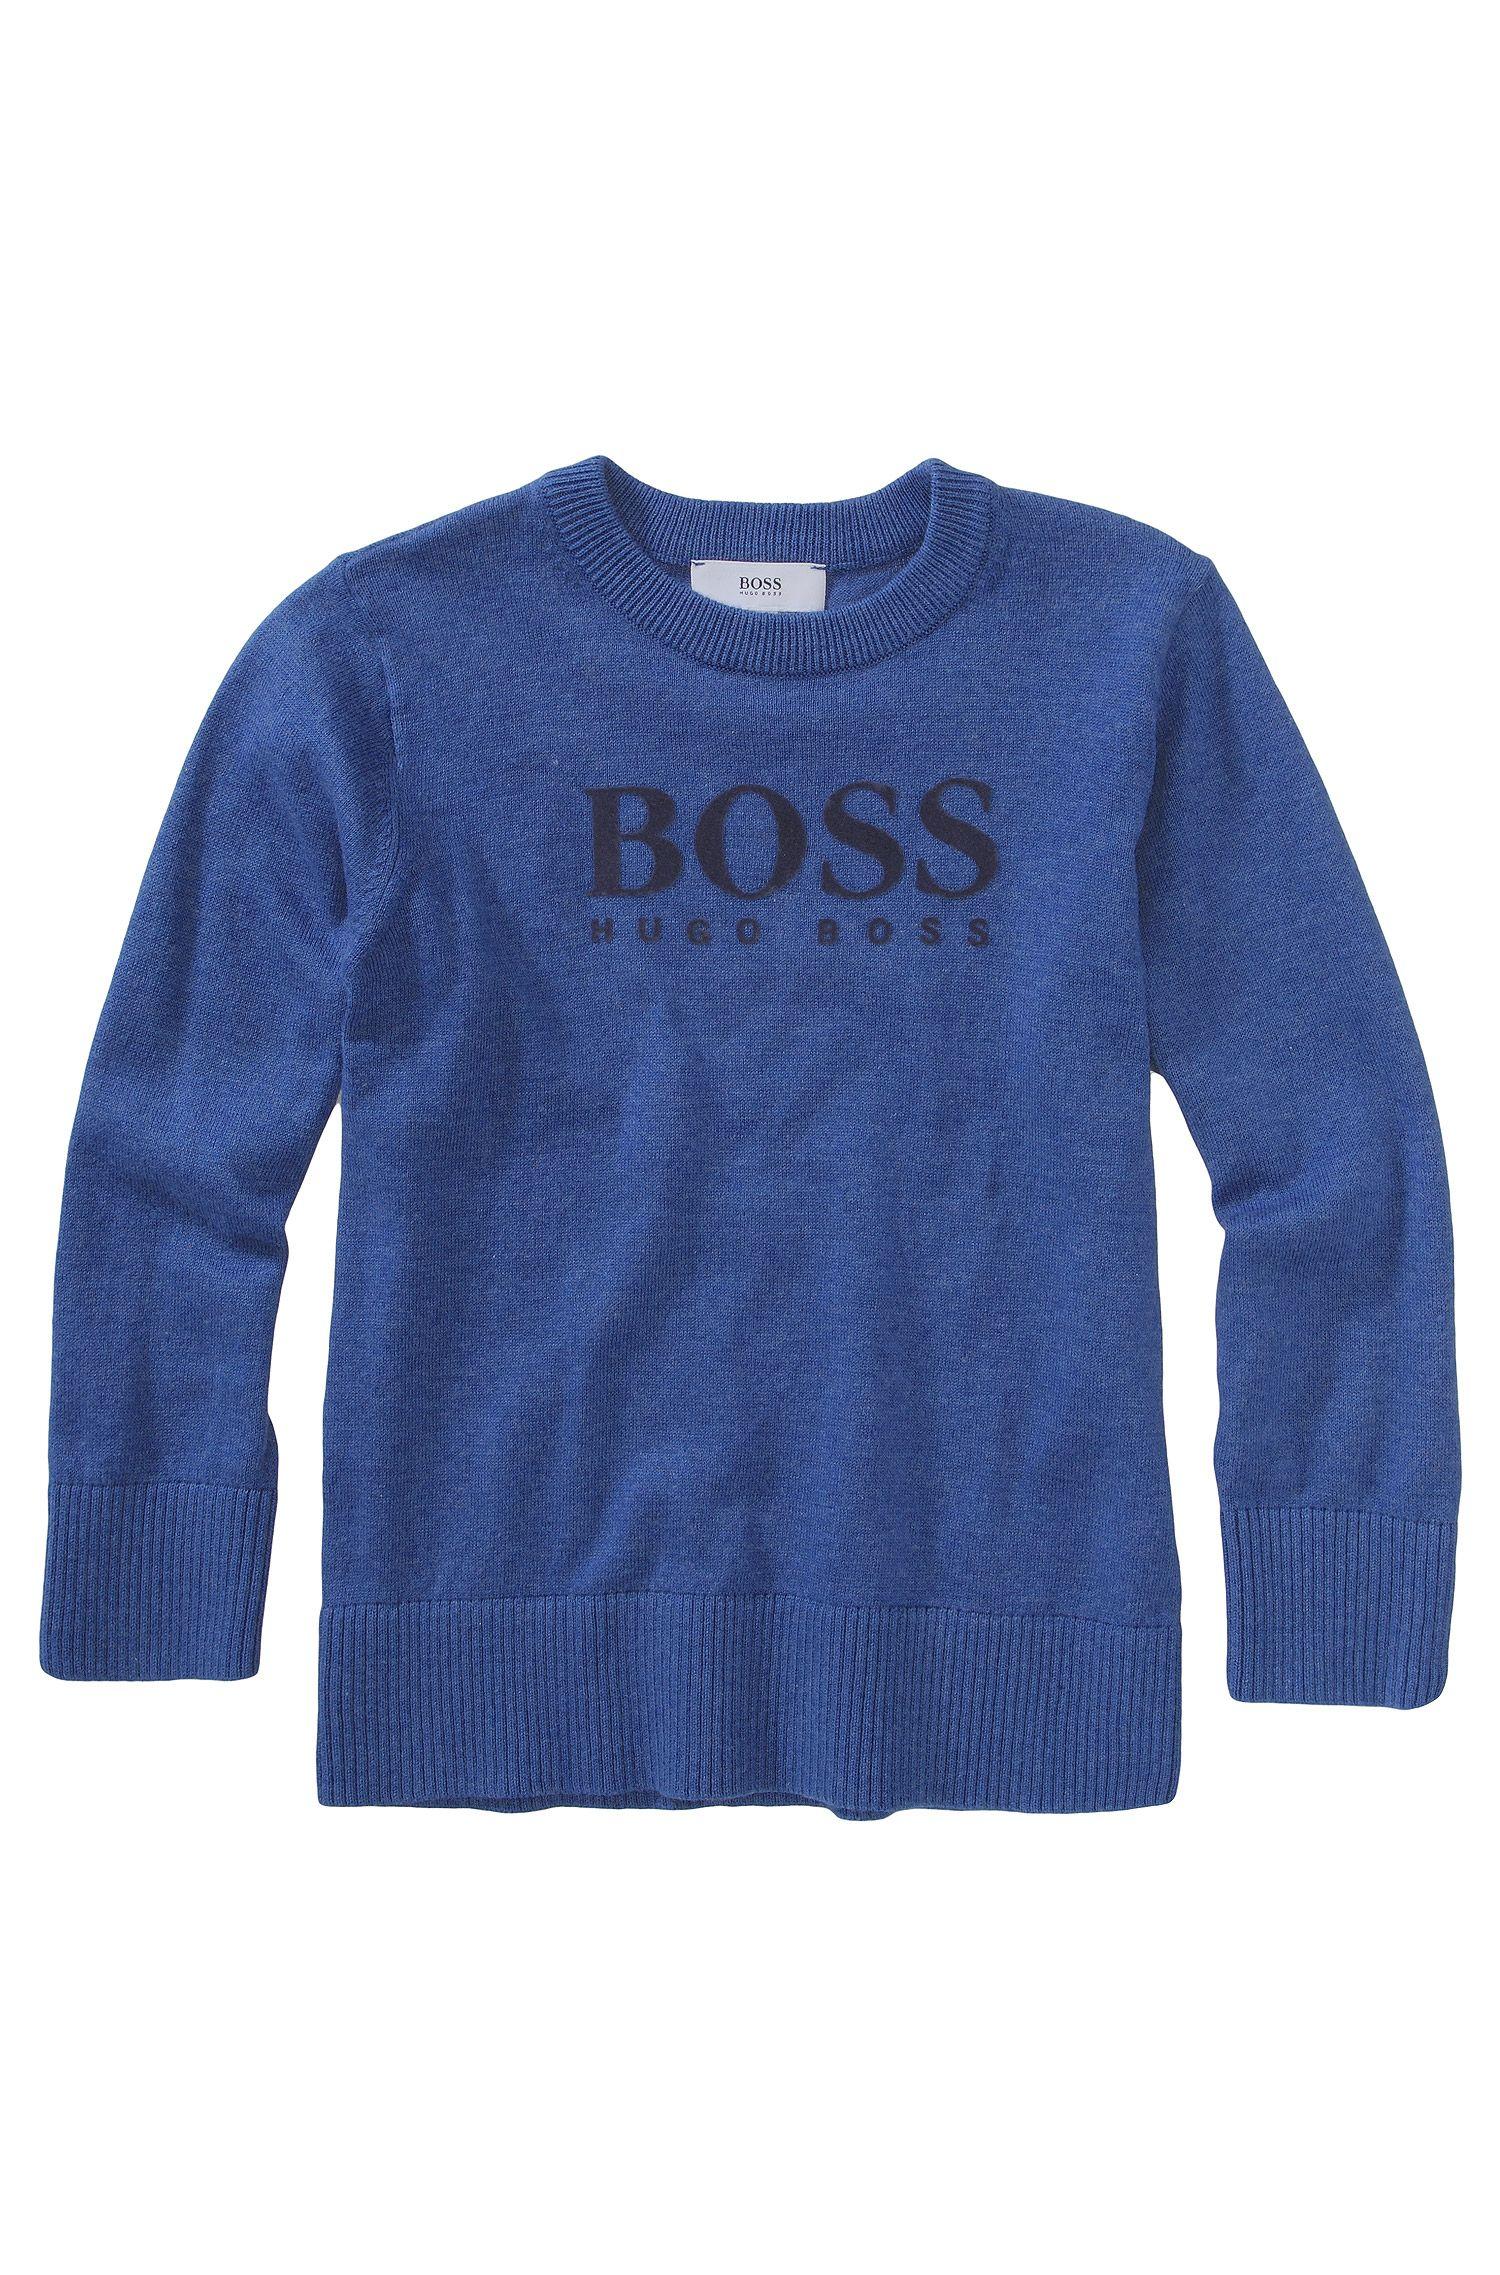 'J25550' | Boys Cotton Wool Blend Crewneck Sweater